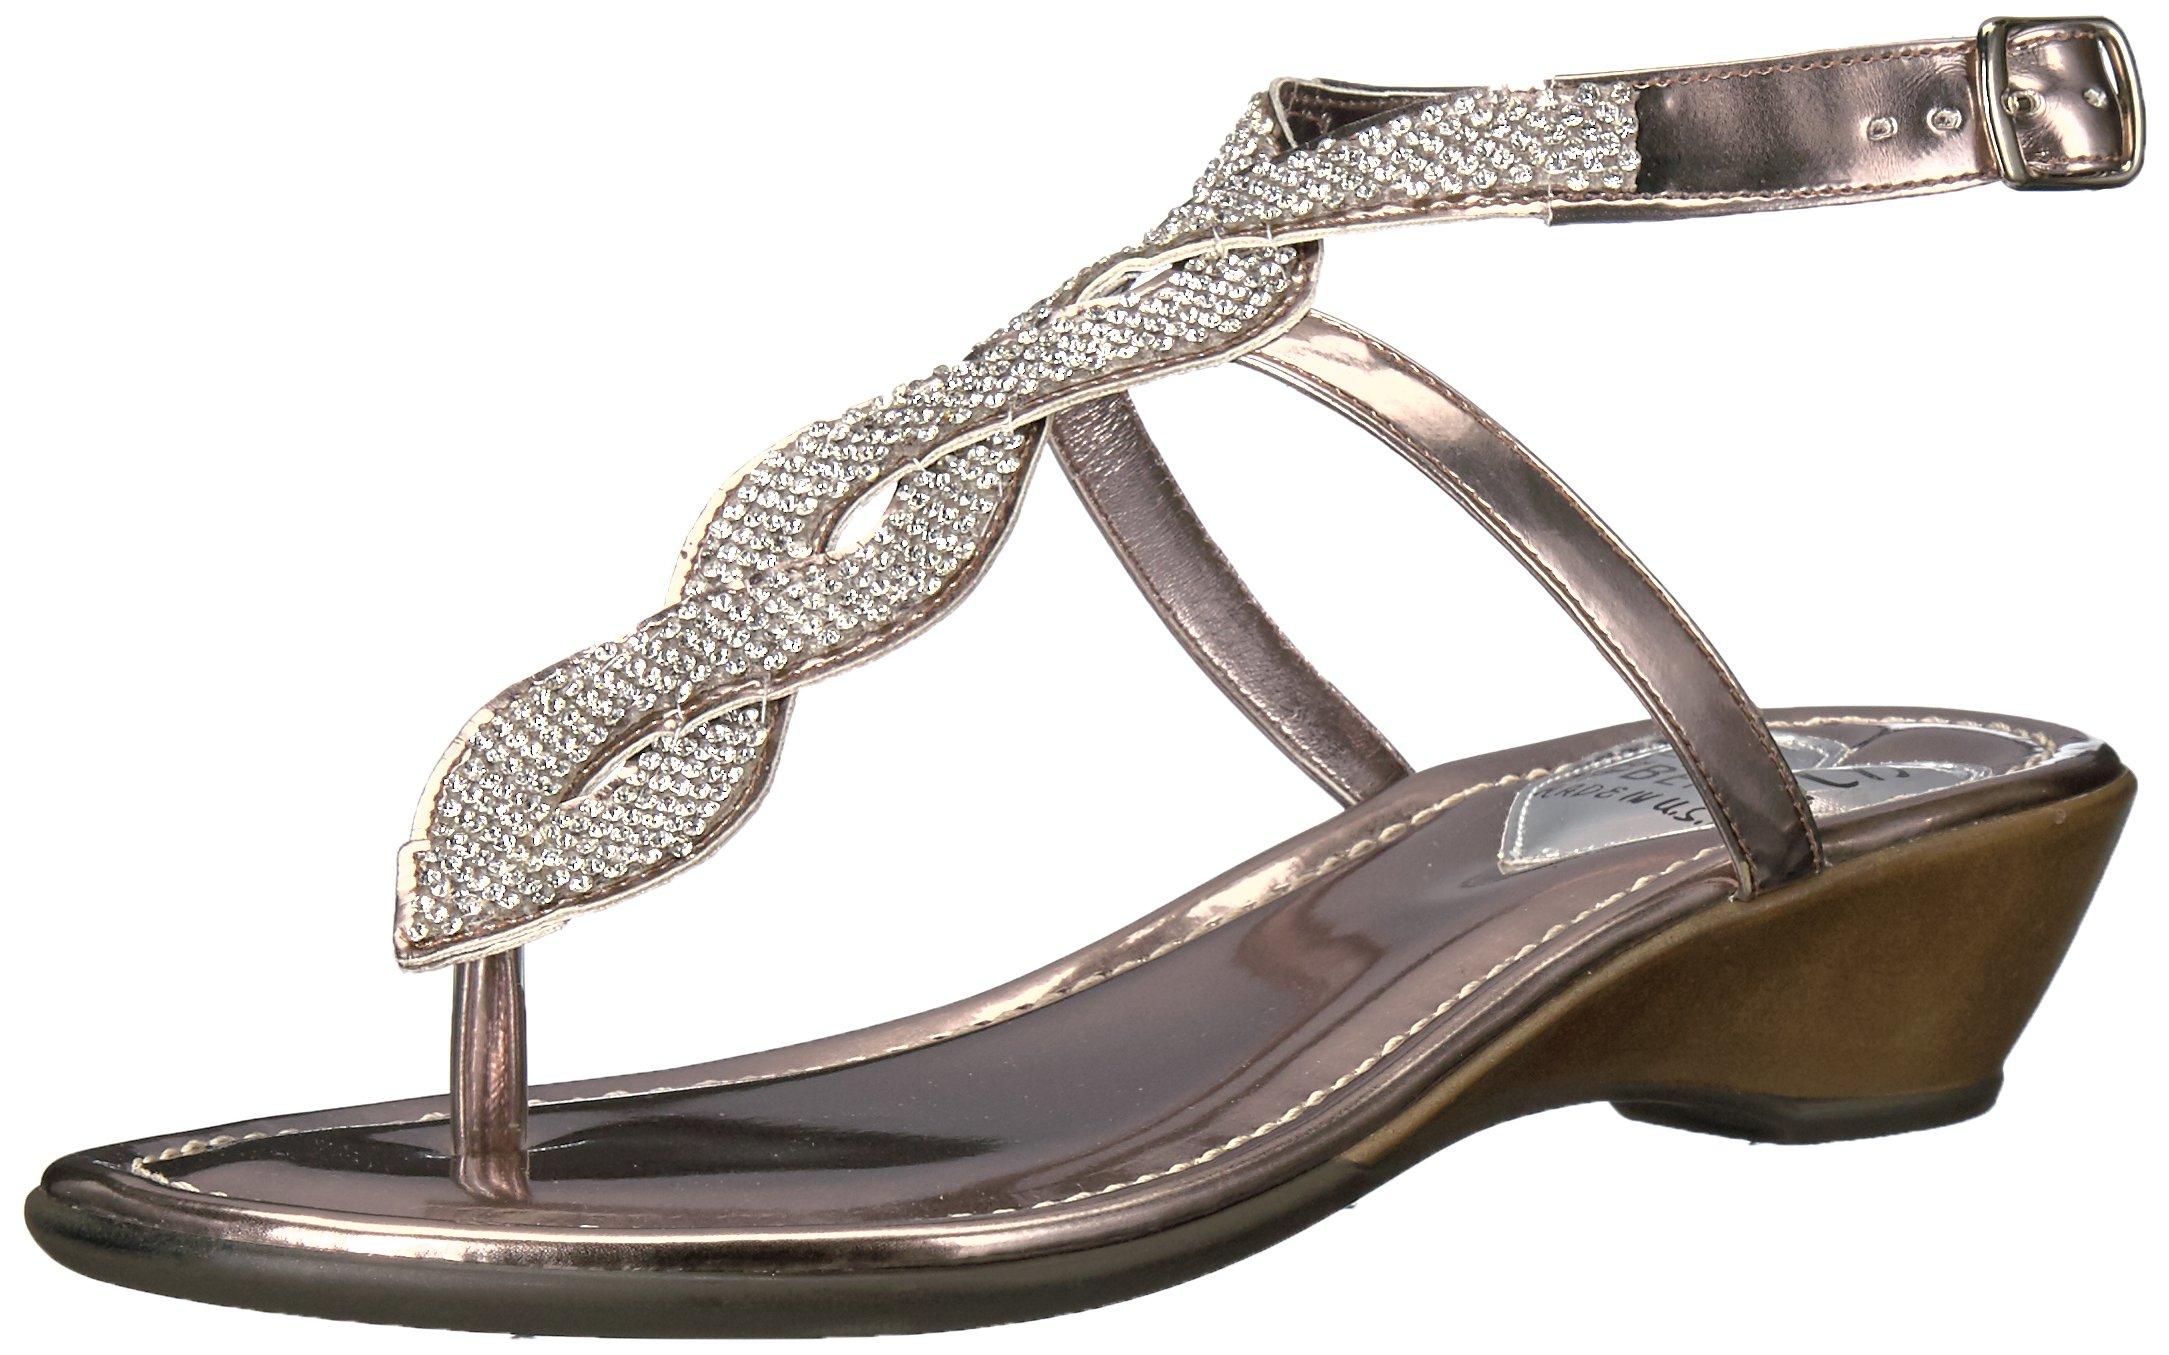 Love & Liberty Women's Sapphire-Ll Dress Sandal, Pewter, 7 M US